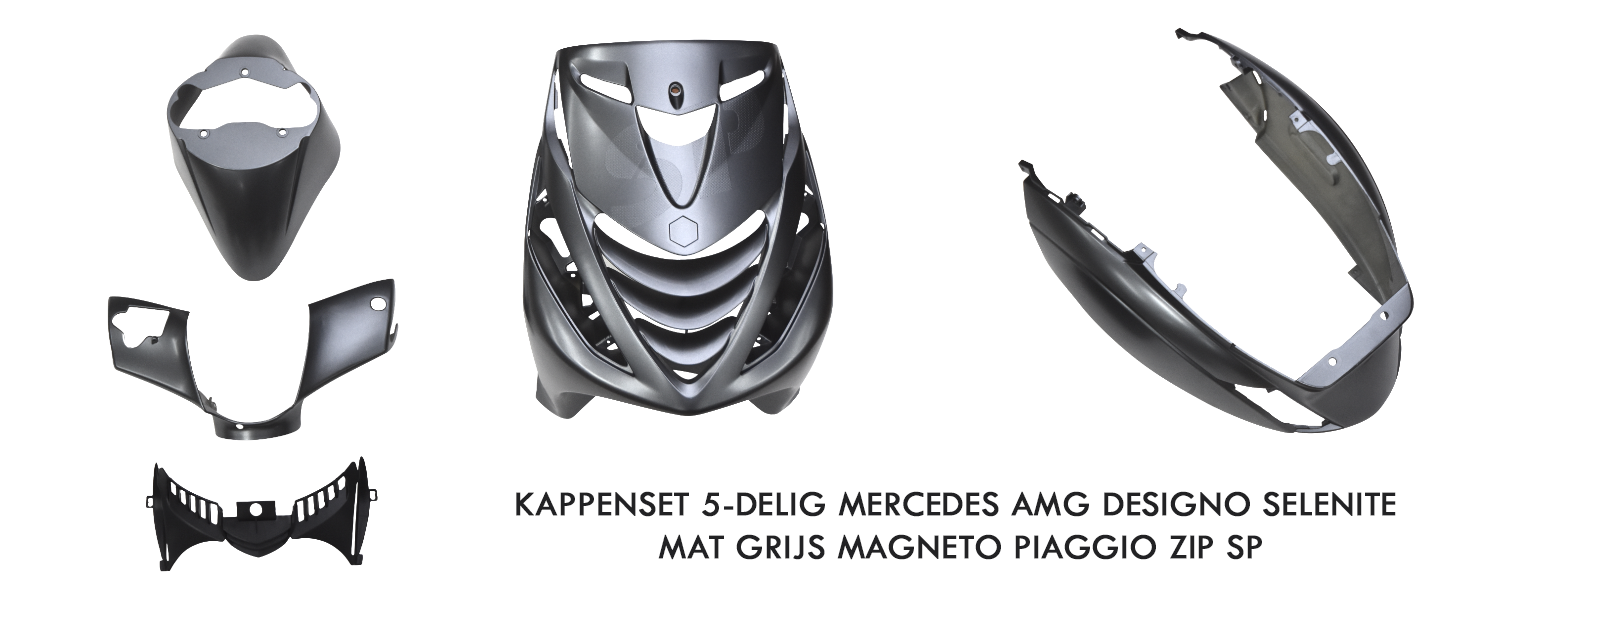 Kappenset 5-delig Mercedes AMG Designo Selenite Mat Grijs Magneto Piaggio Zip SP